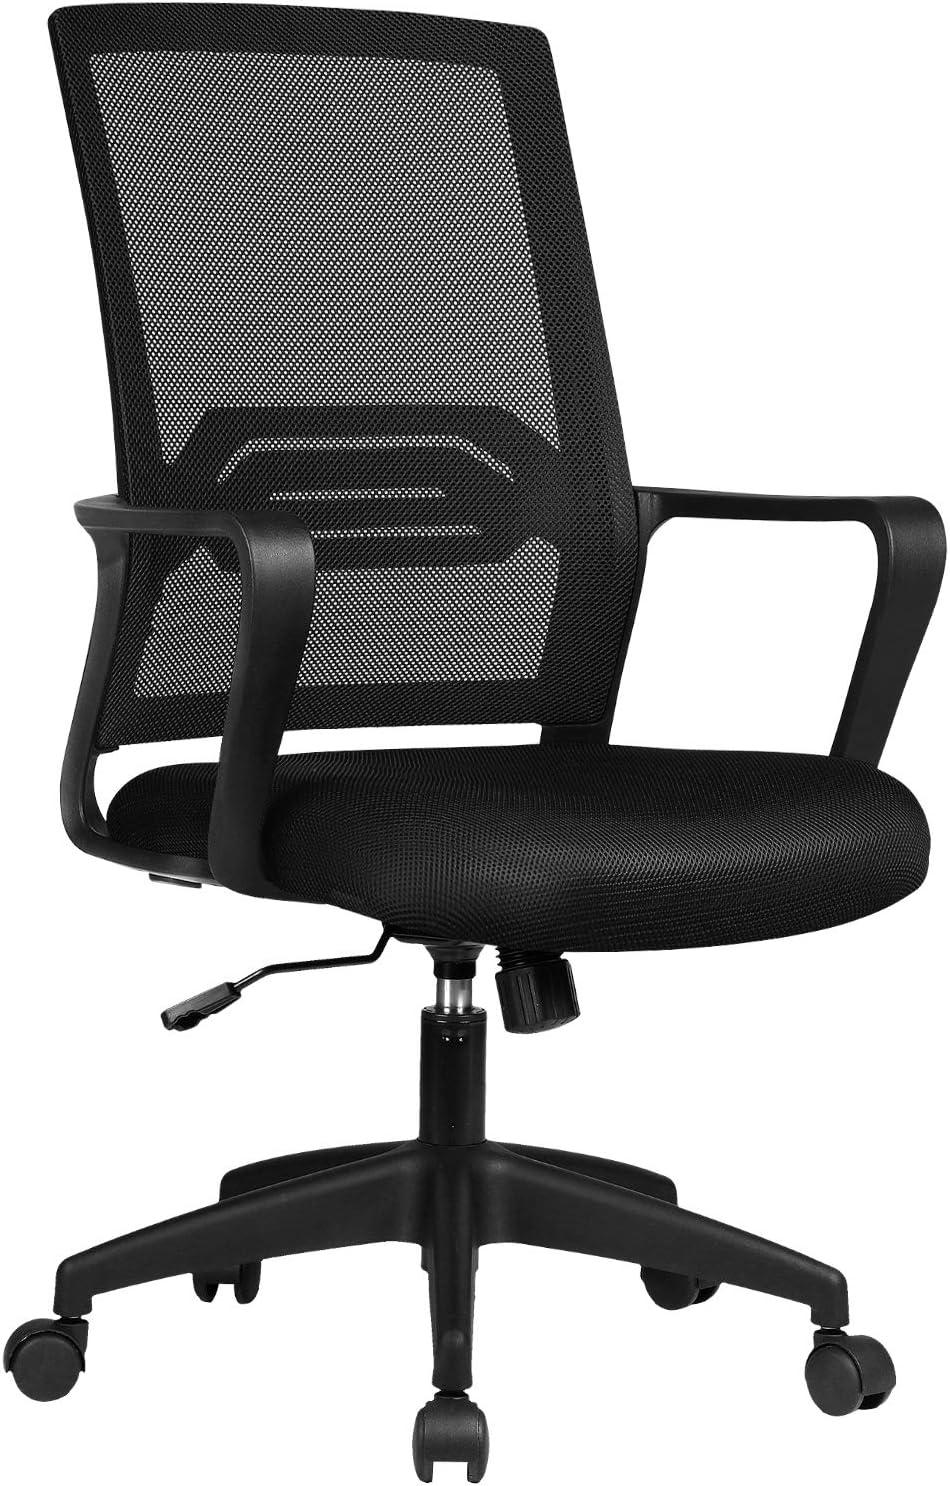 comhoma,オフィスチェア,黒の椅子,デスクチェア,メッシュ生地,ロッキング